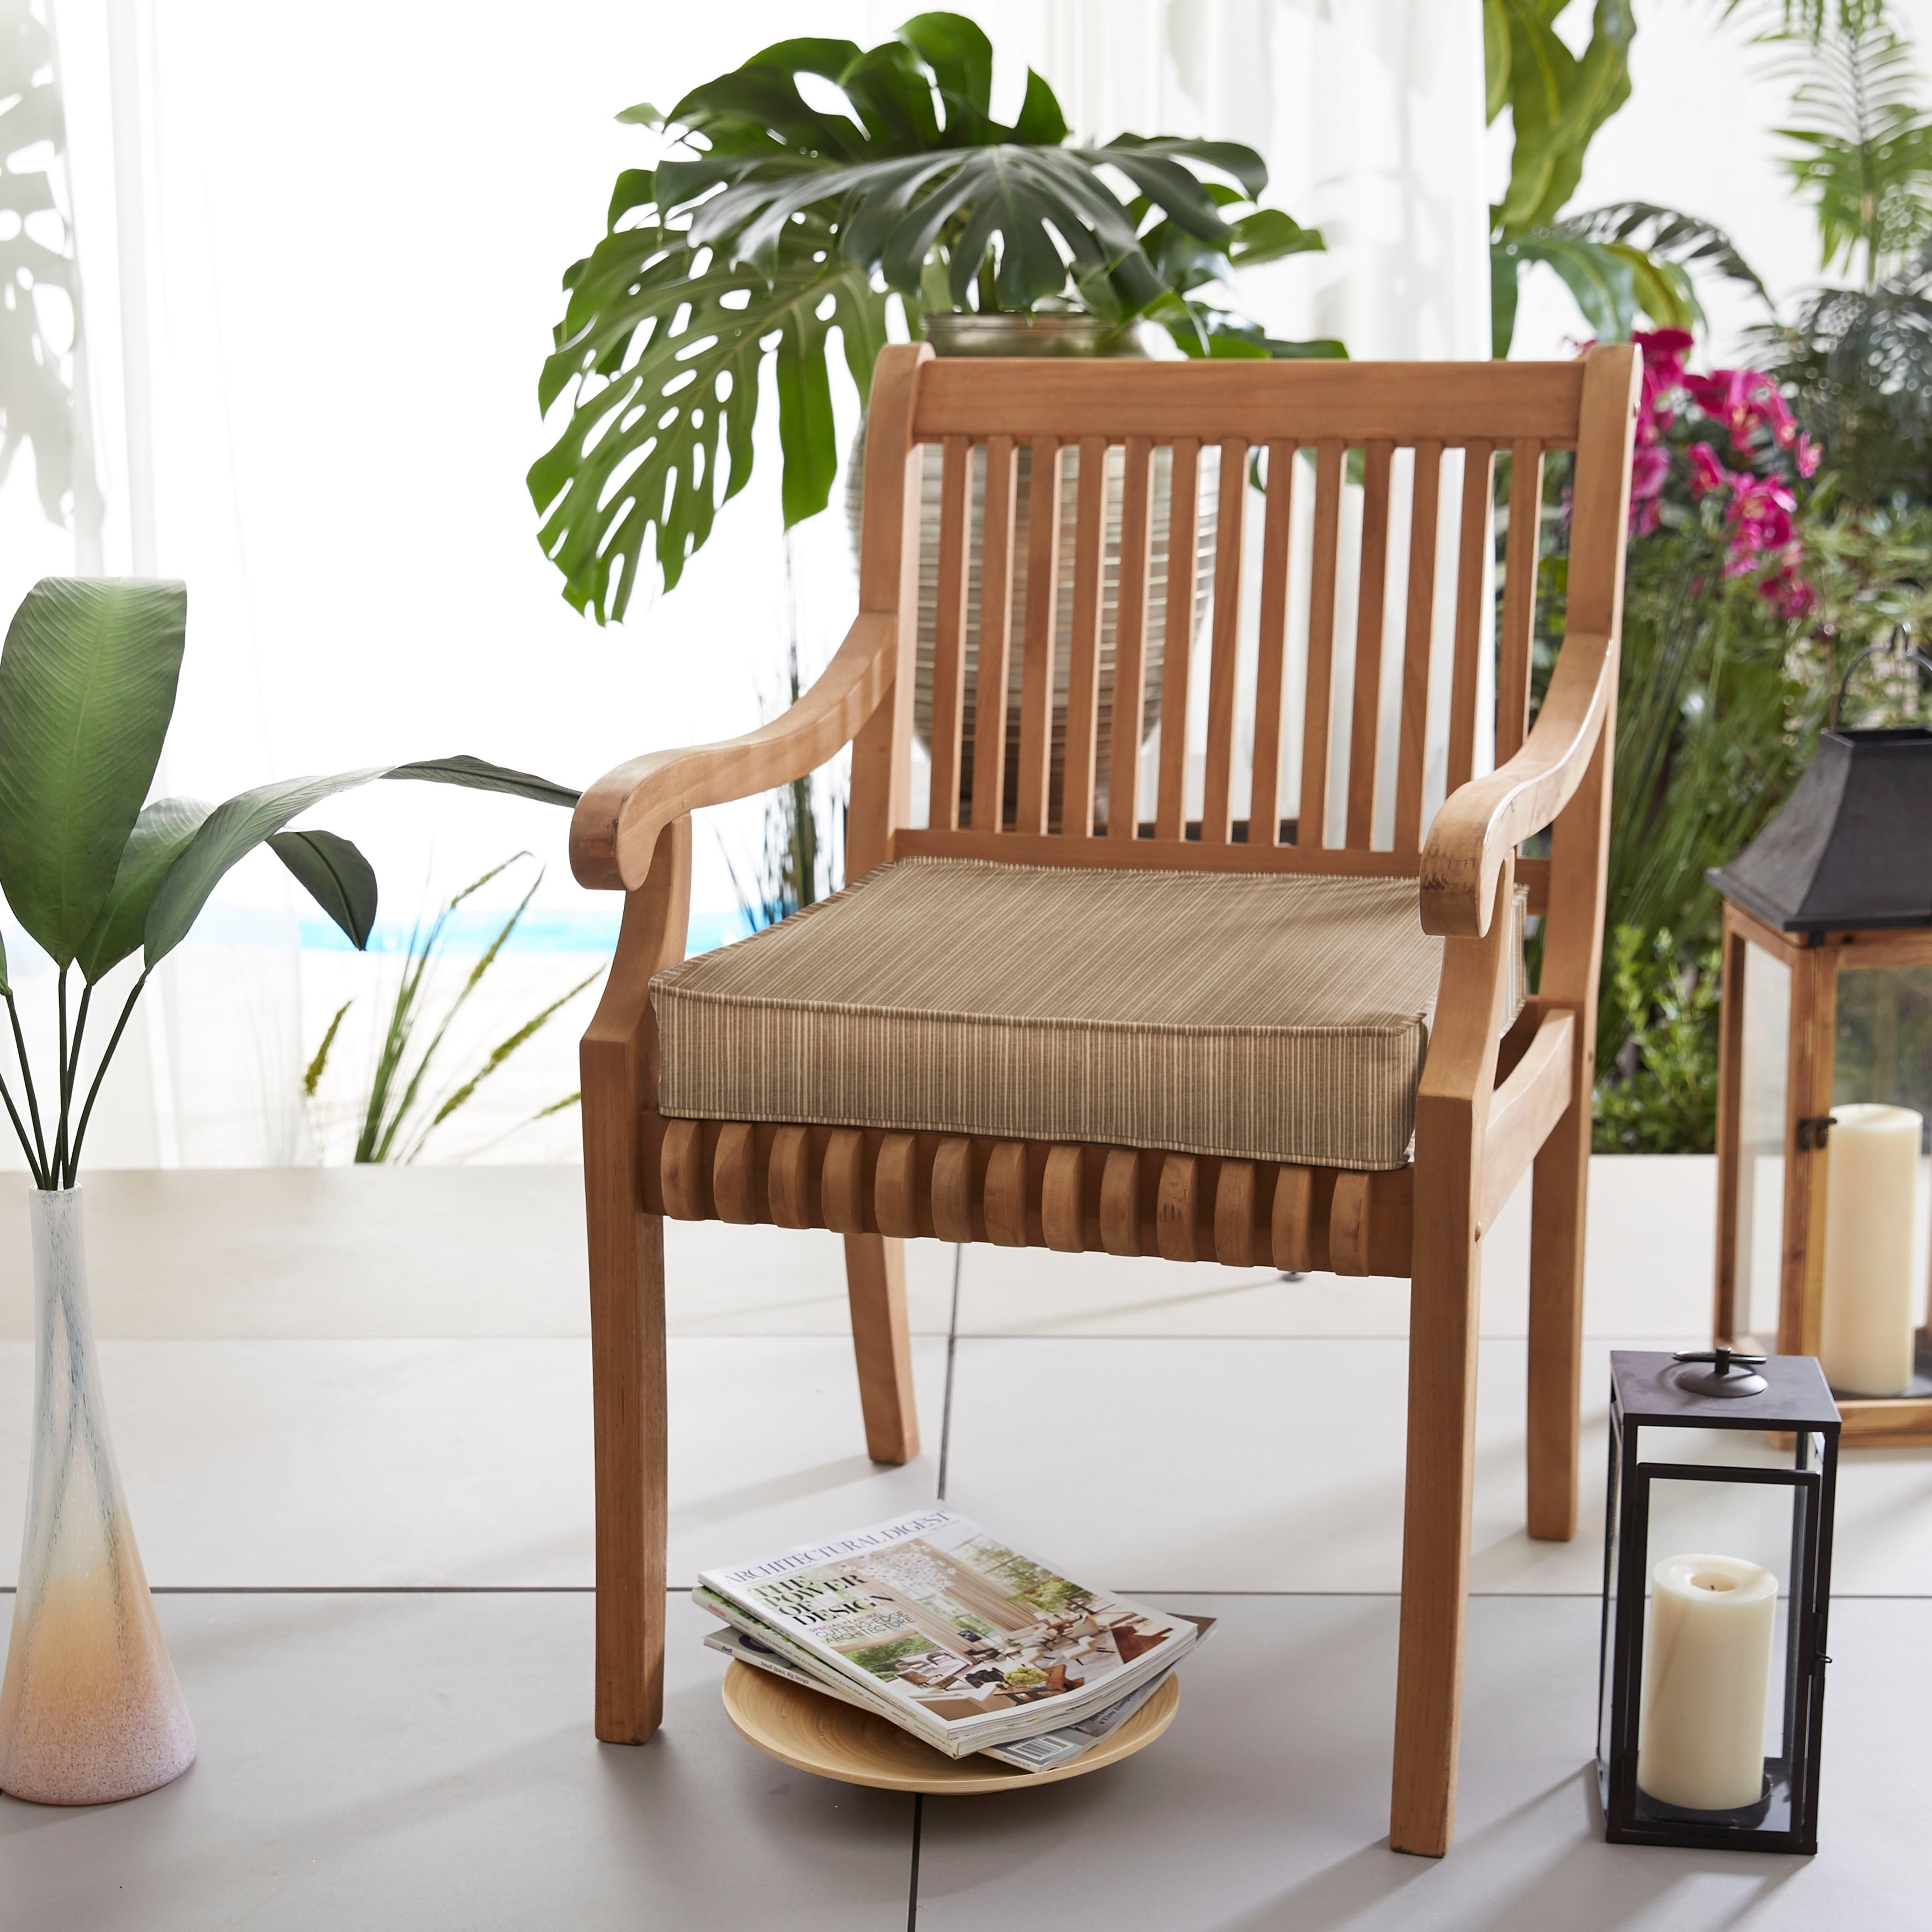 Shop Sunbrella Indoor/ Outdoor Textured 19 in Chair Cushion, Corded ...